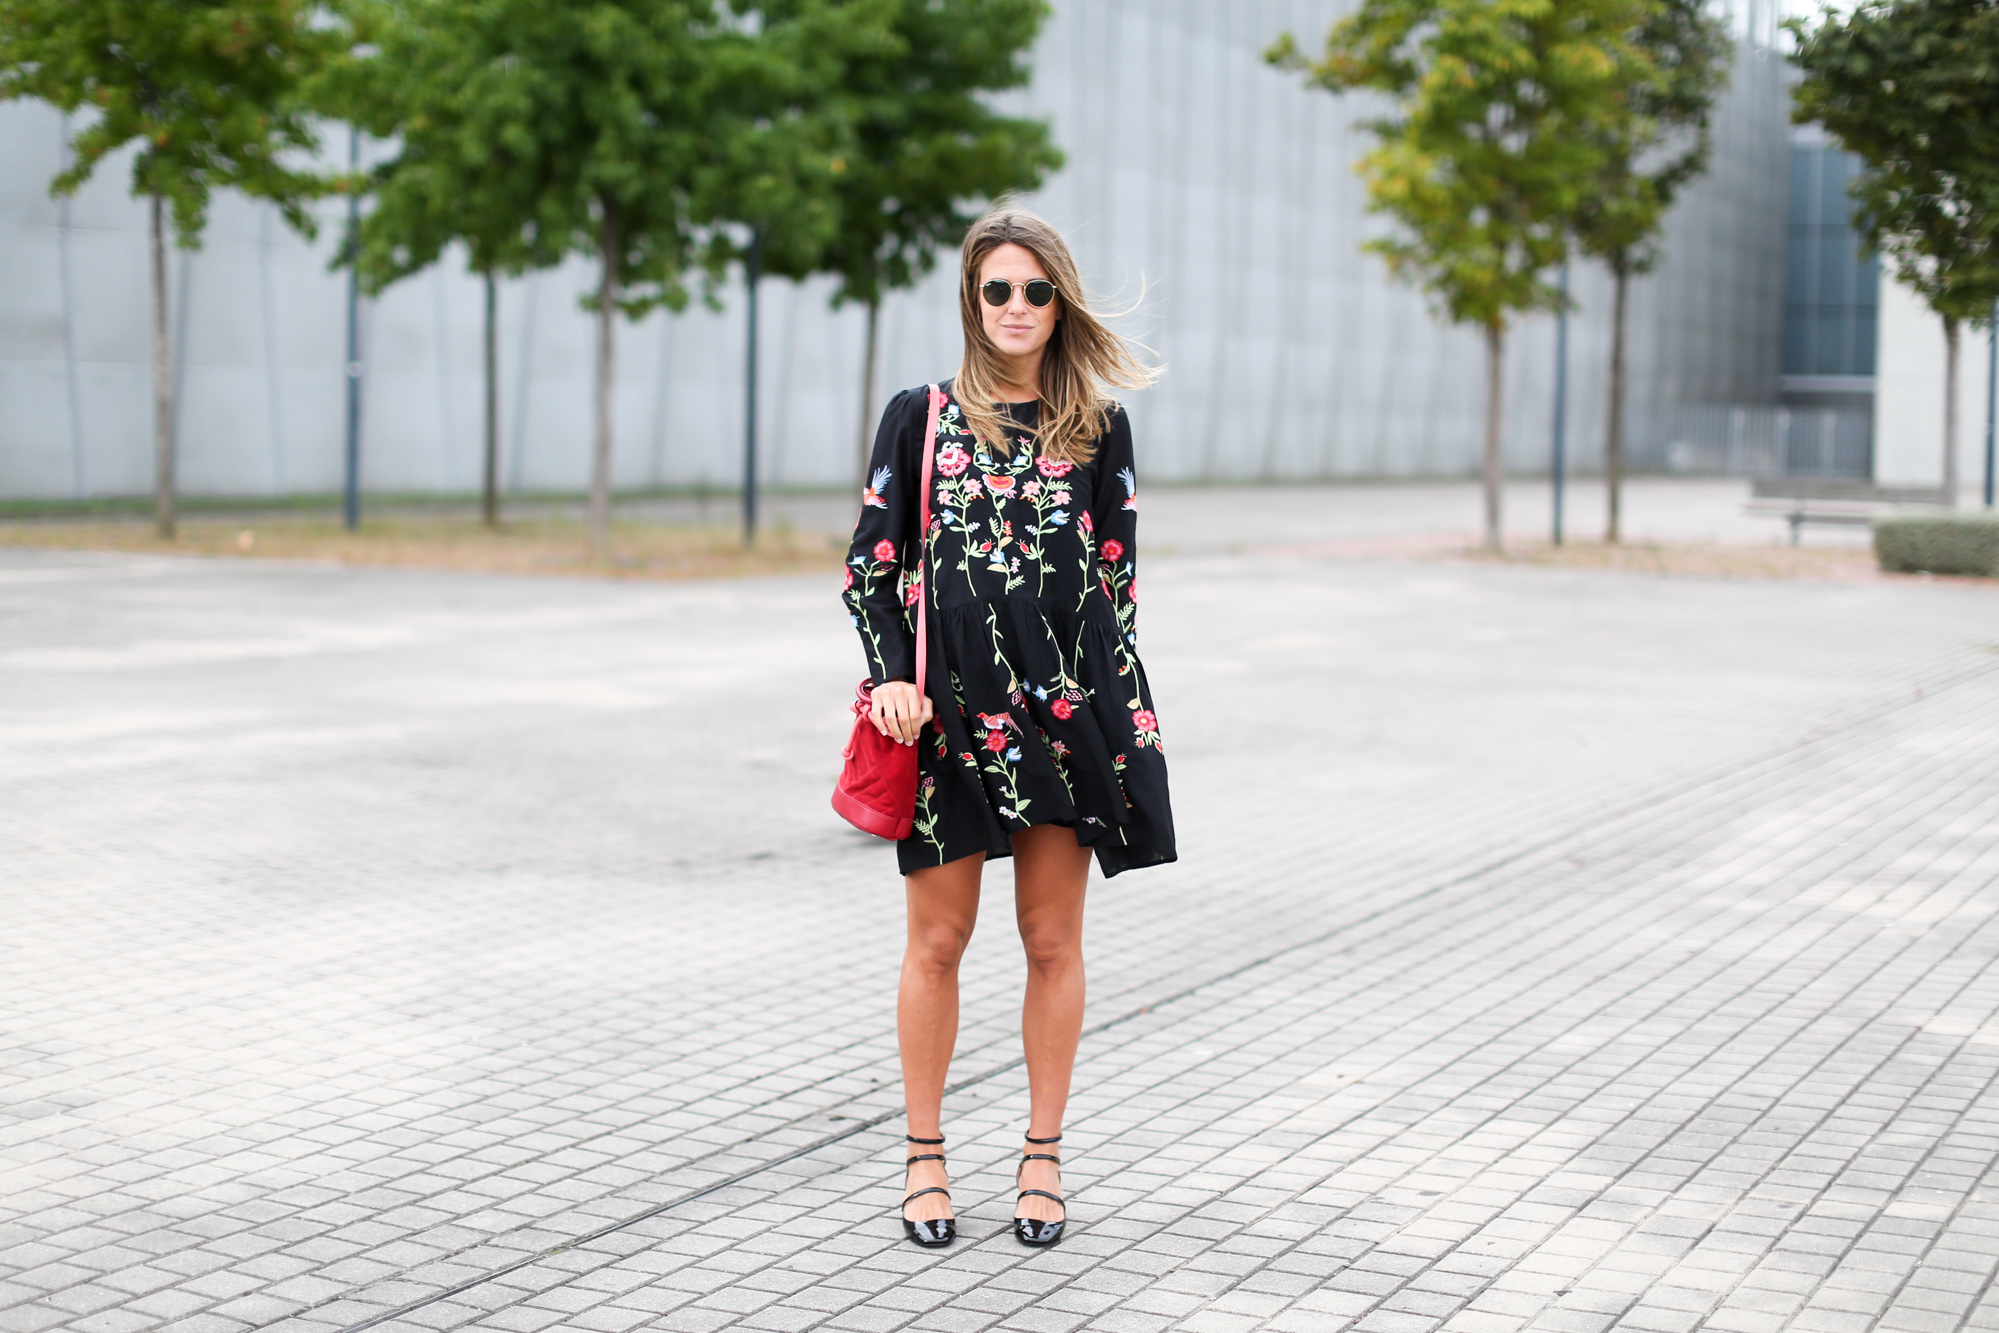 Clochet_streetstyle_fashionblogger_zaraembroidedminidress_titamadrid_miniparadis-6